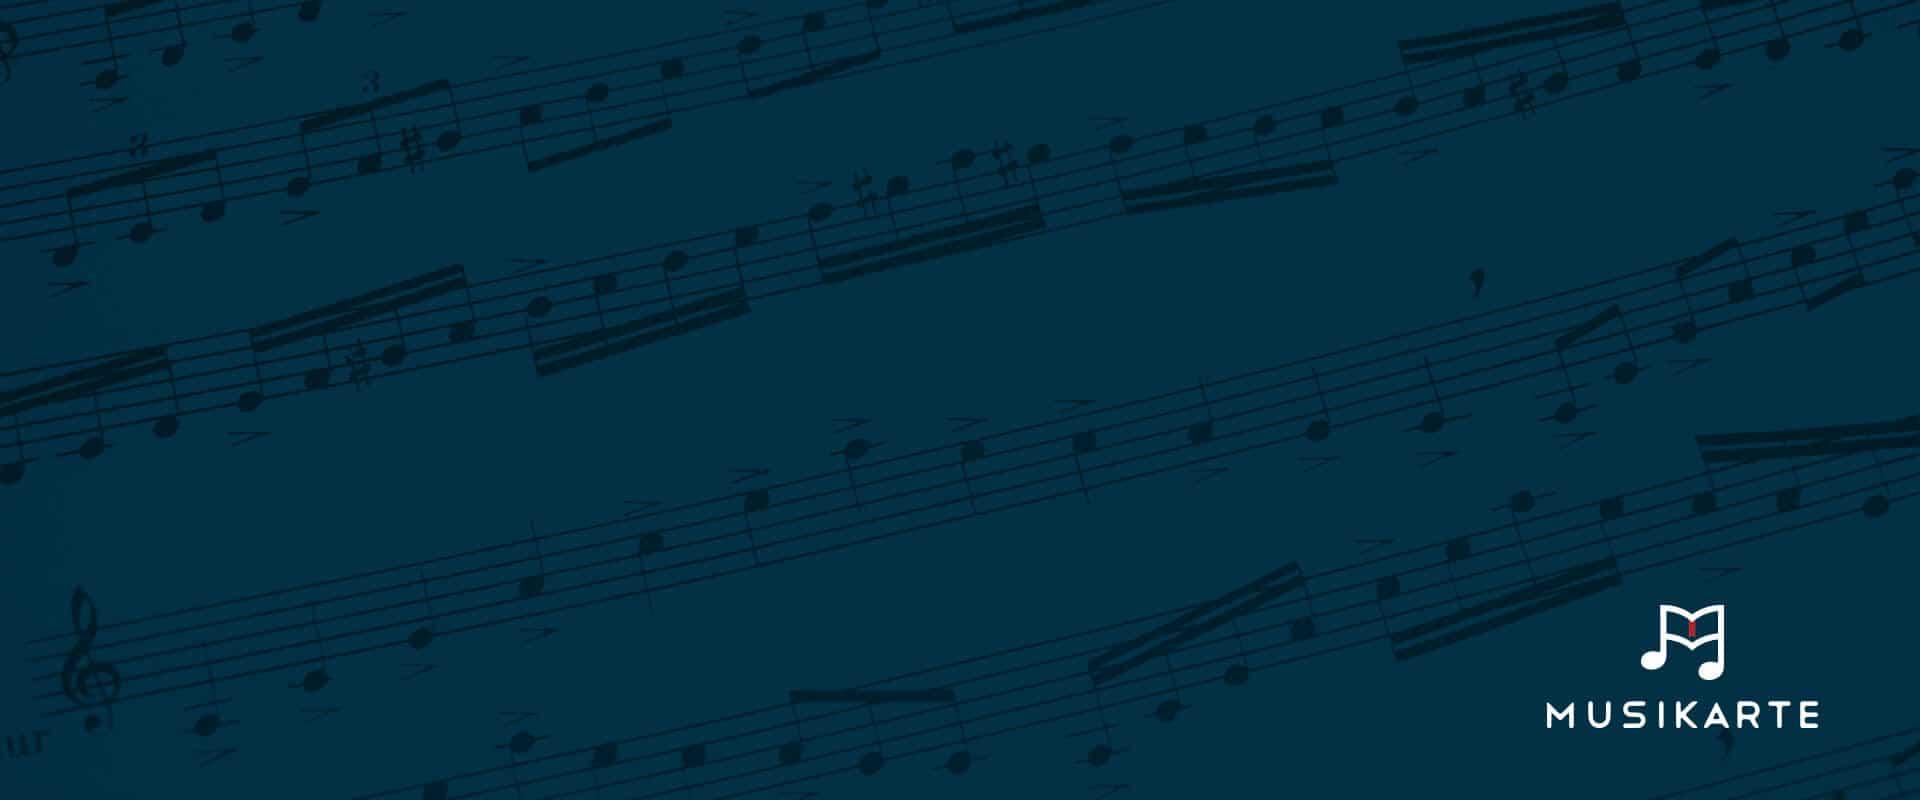 Musikarte